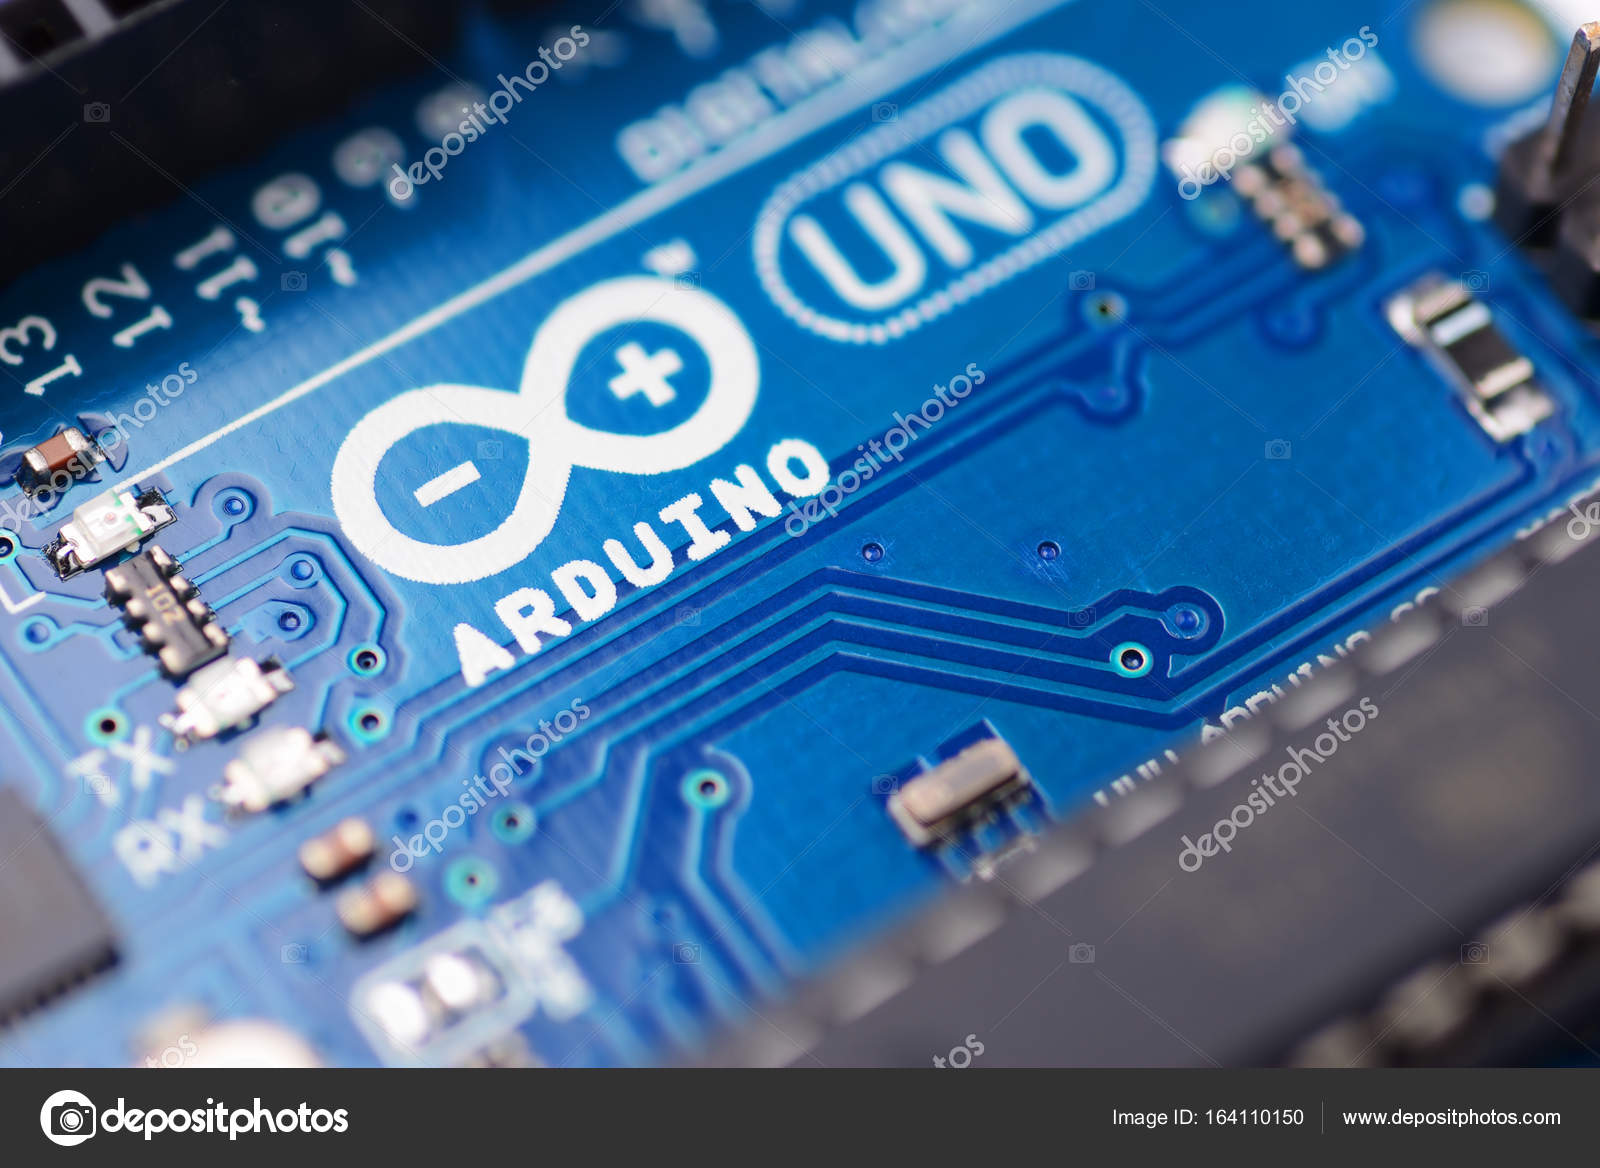 Arduino Uno Microcontroller Stock Editorial Photo Ha4ipiri Arduinocircuitboardjpg Brest Belarus August 22 2017 Pcb Board For Programming Education Development Logo Macro Shot By